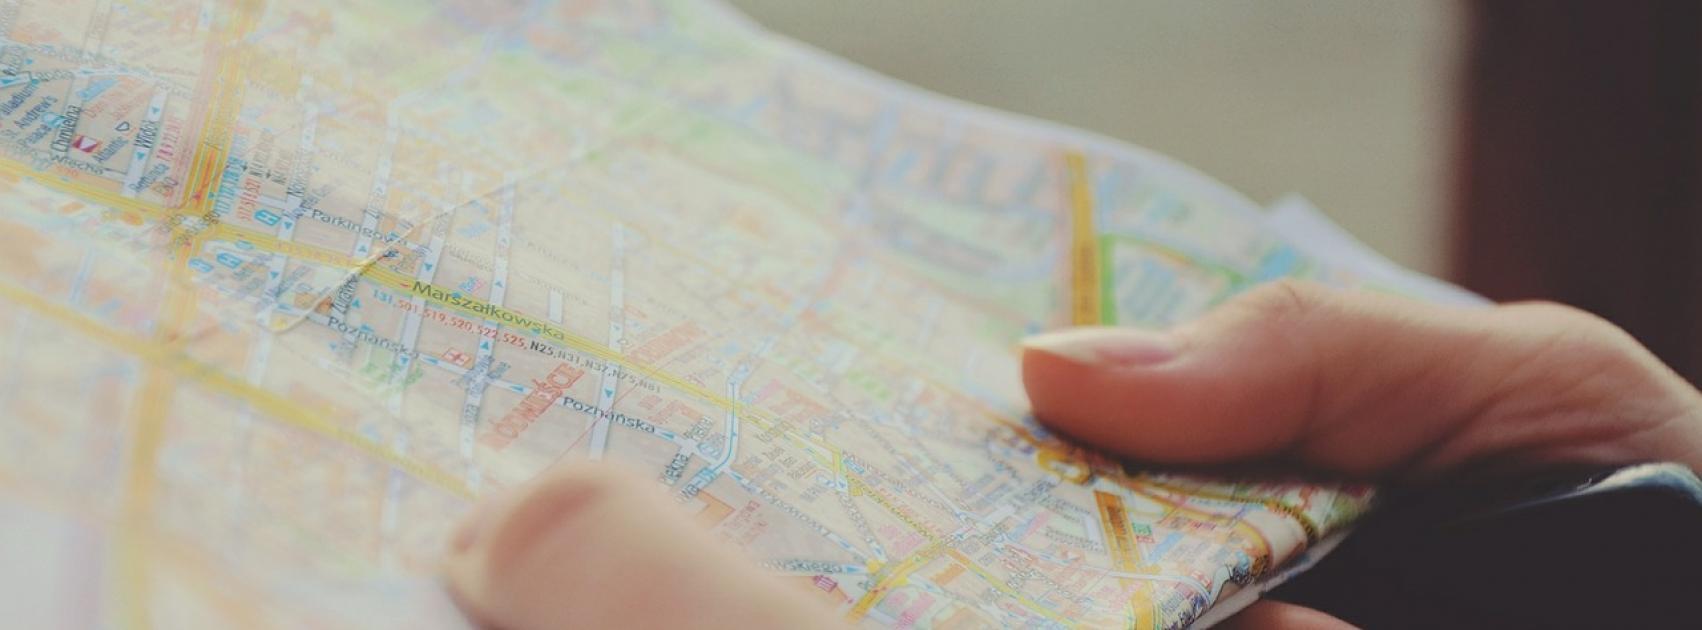 map-455769_1280_0.jpg